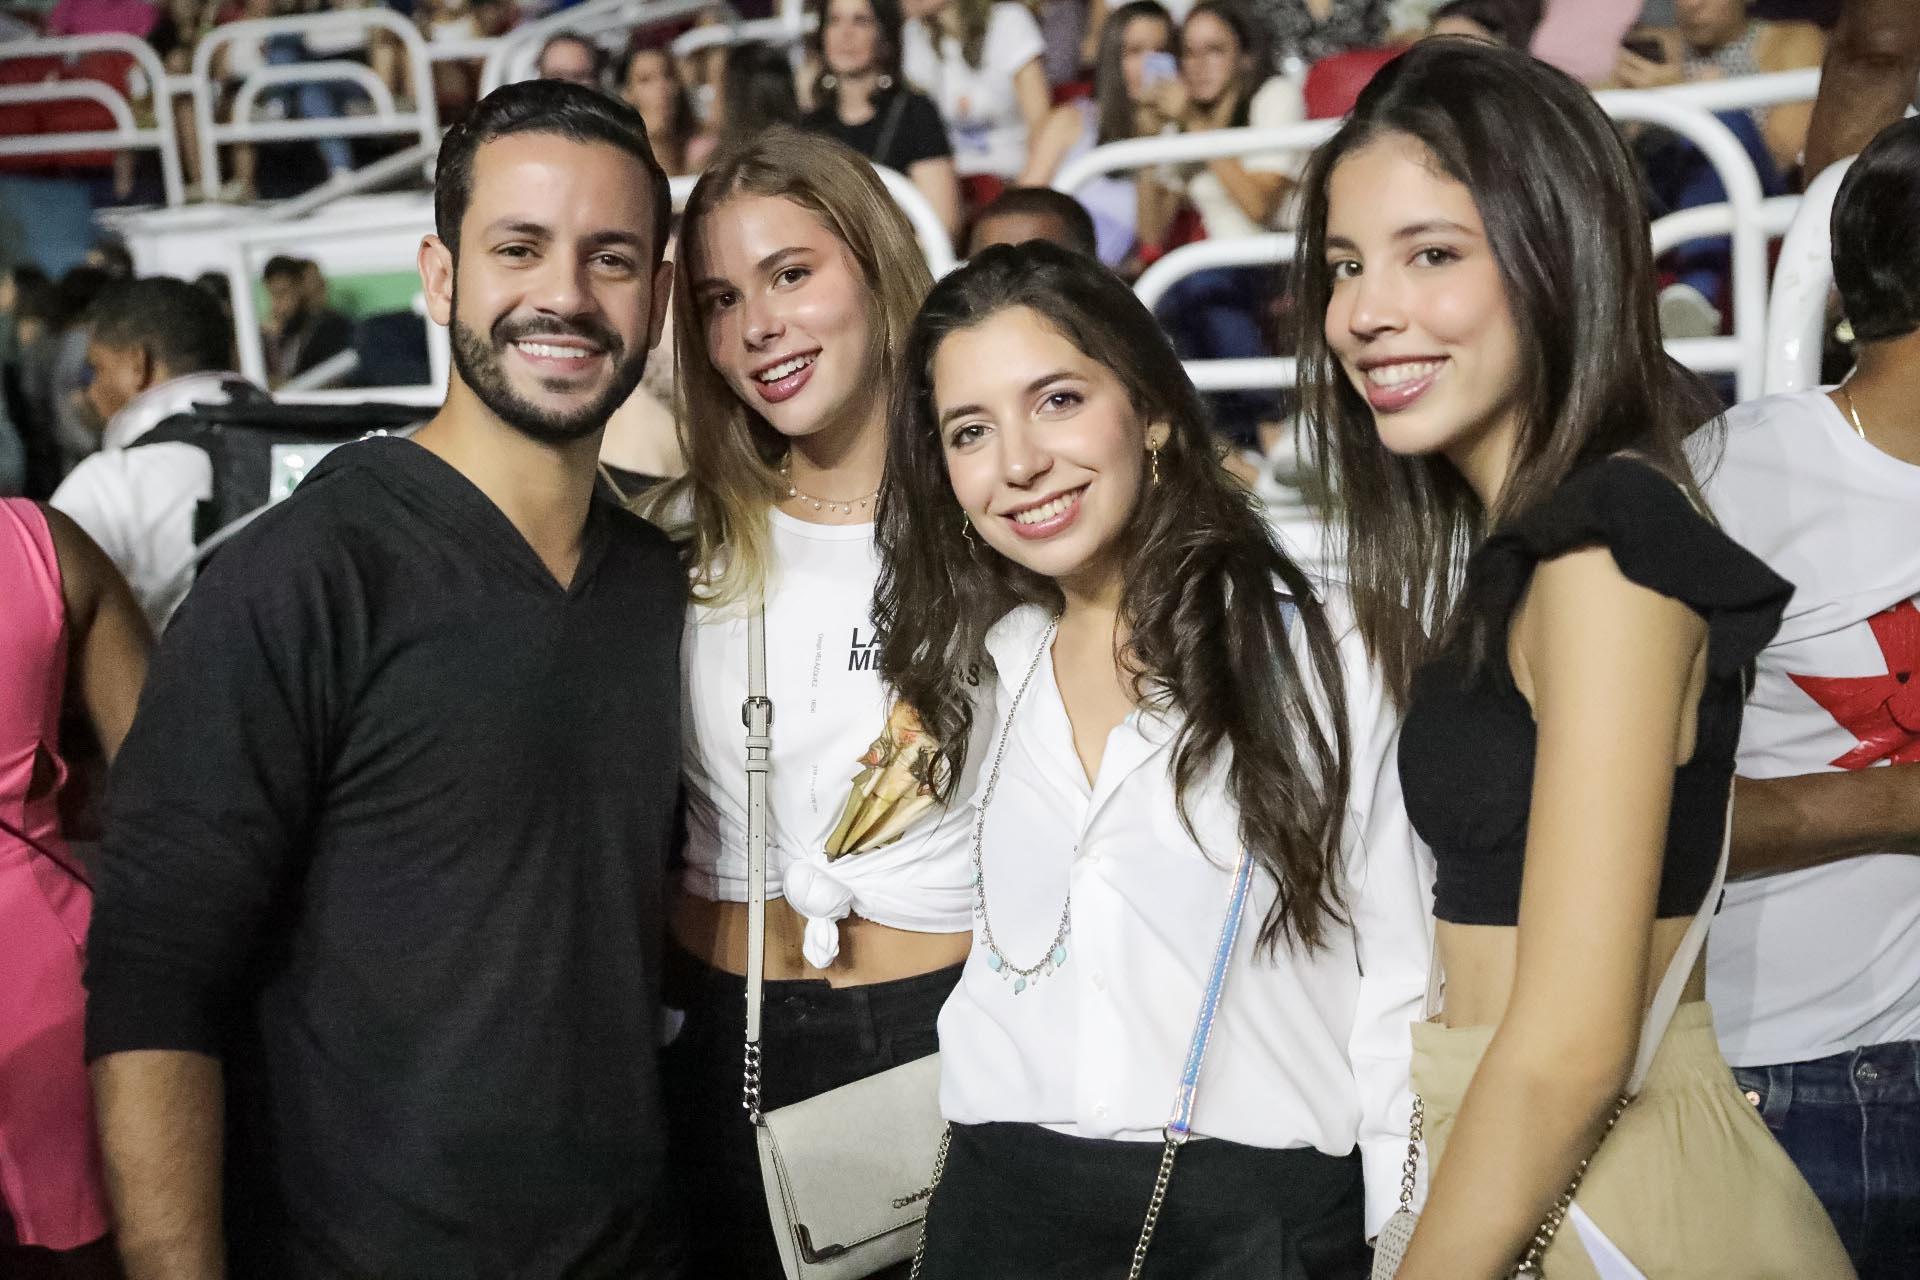 10. Carlos Durán, Shaylene Saahad, Rosa Hiraldou y Sarah Farre